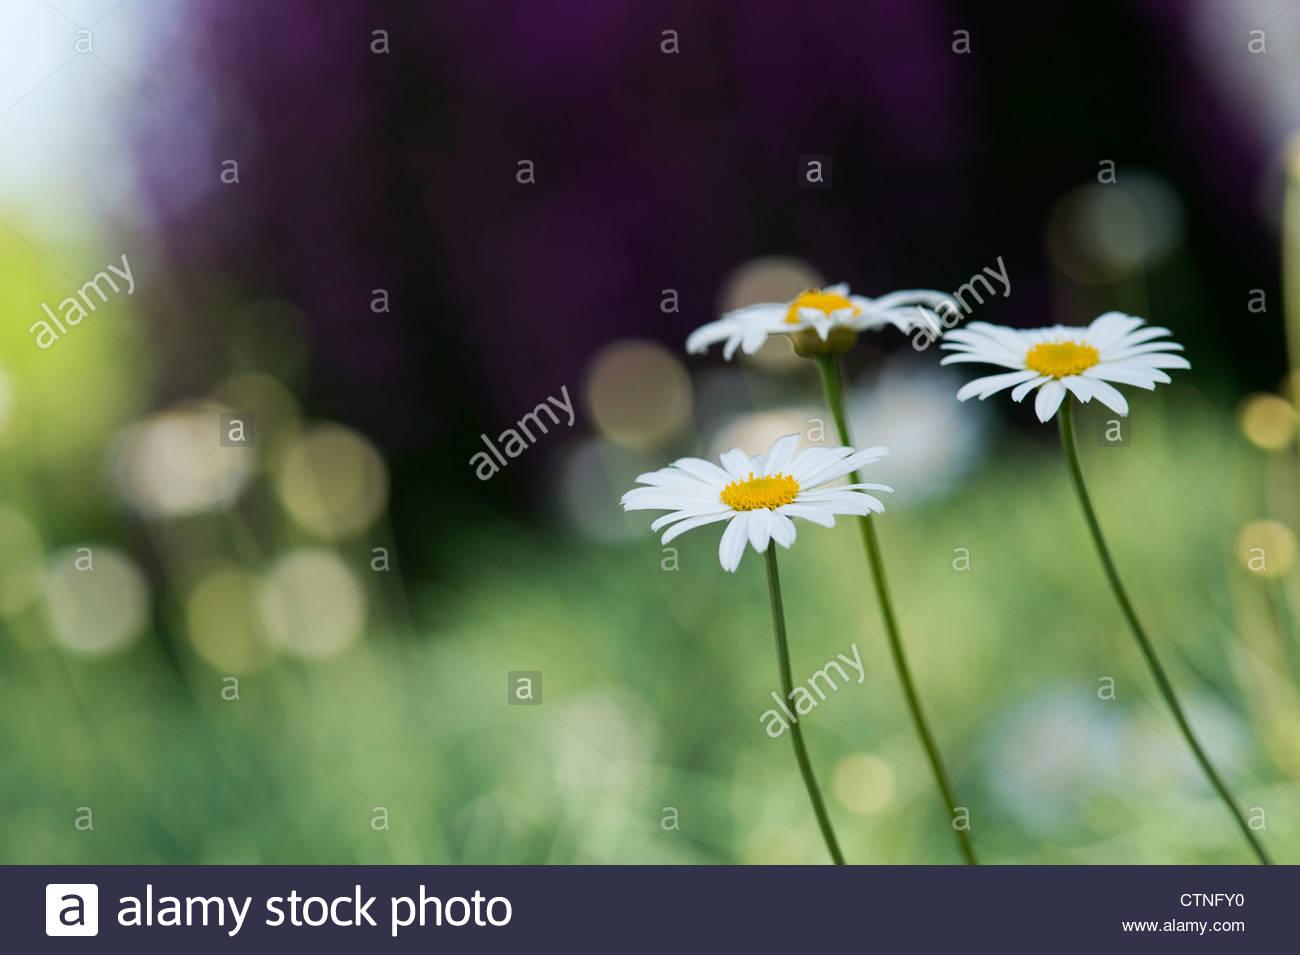 Evergreen daisies stock photos evergreen daisies stock images alamy argyranthemum gracile chelsea girl marguerite flowers stock image izmirmasajfo